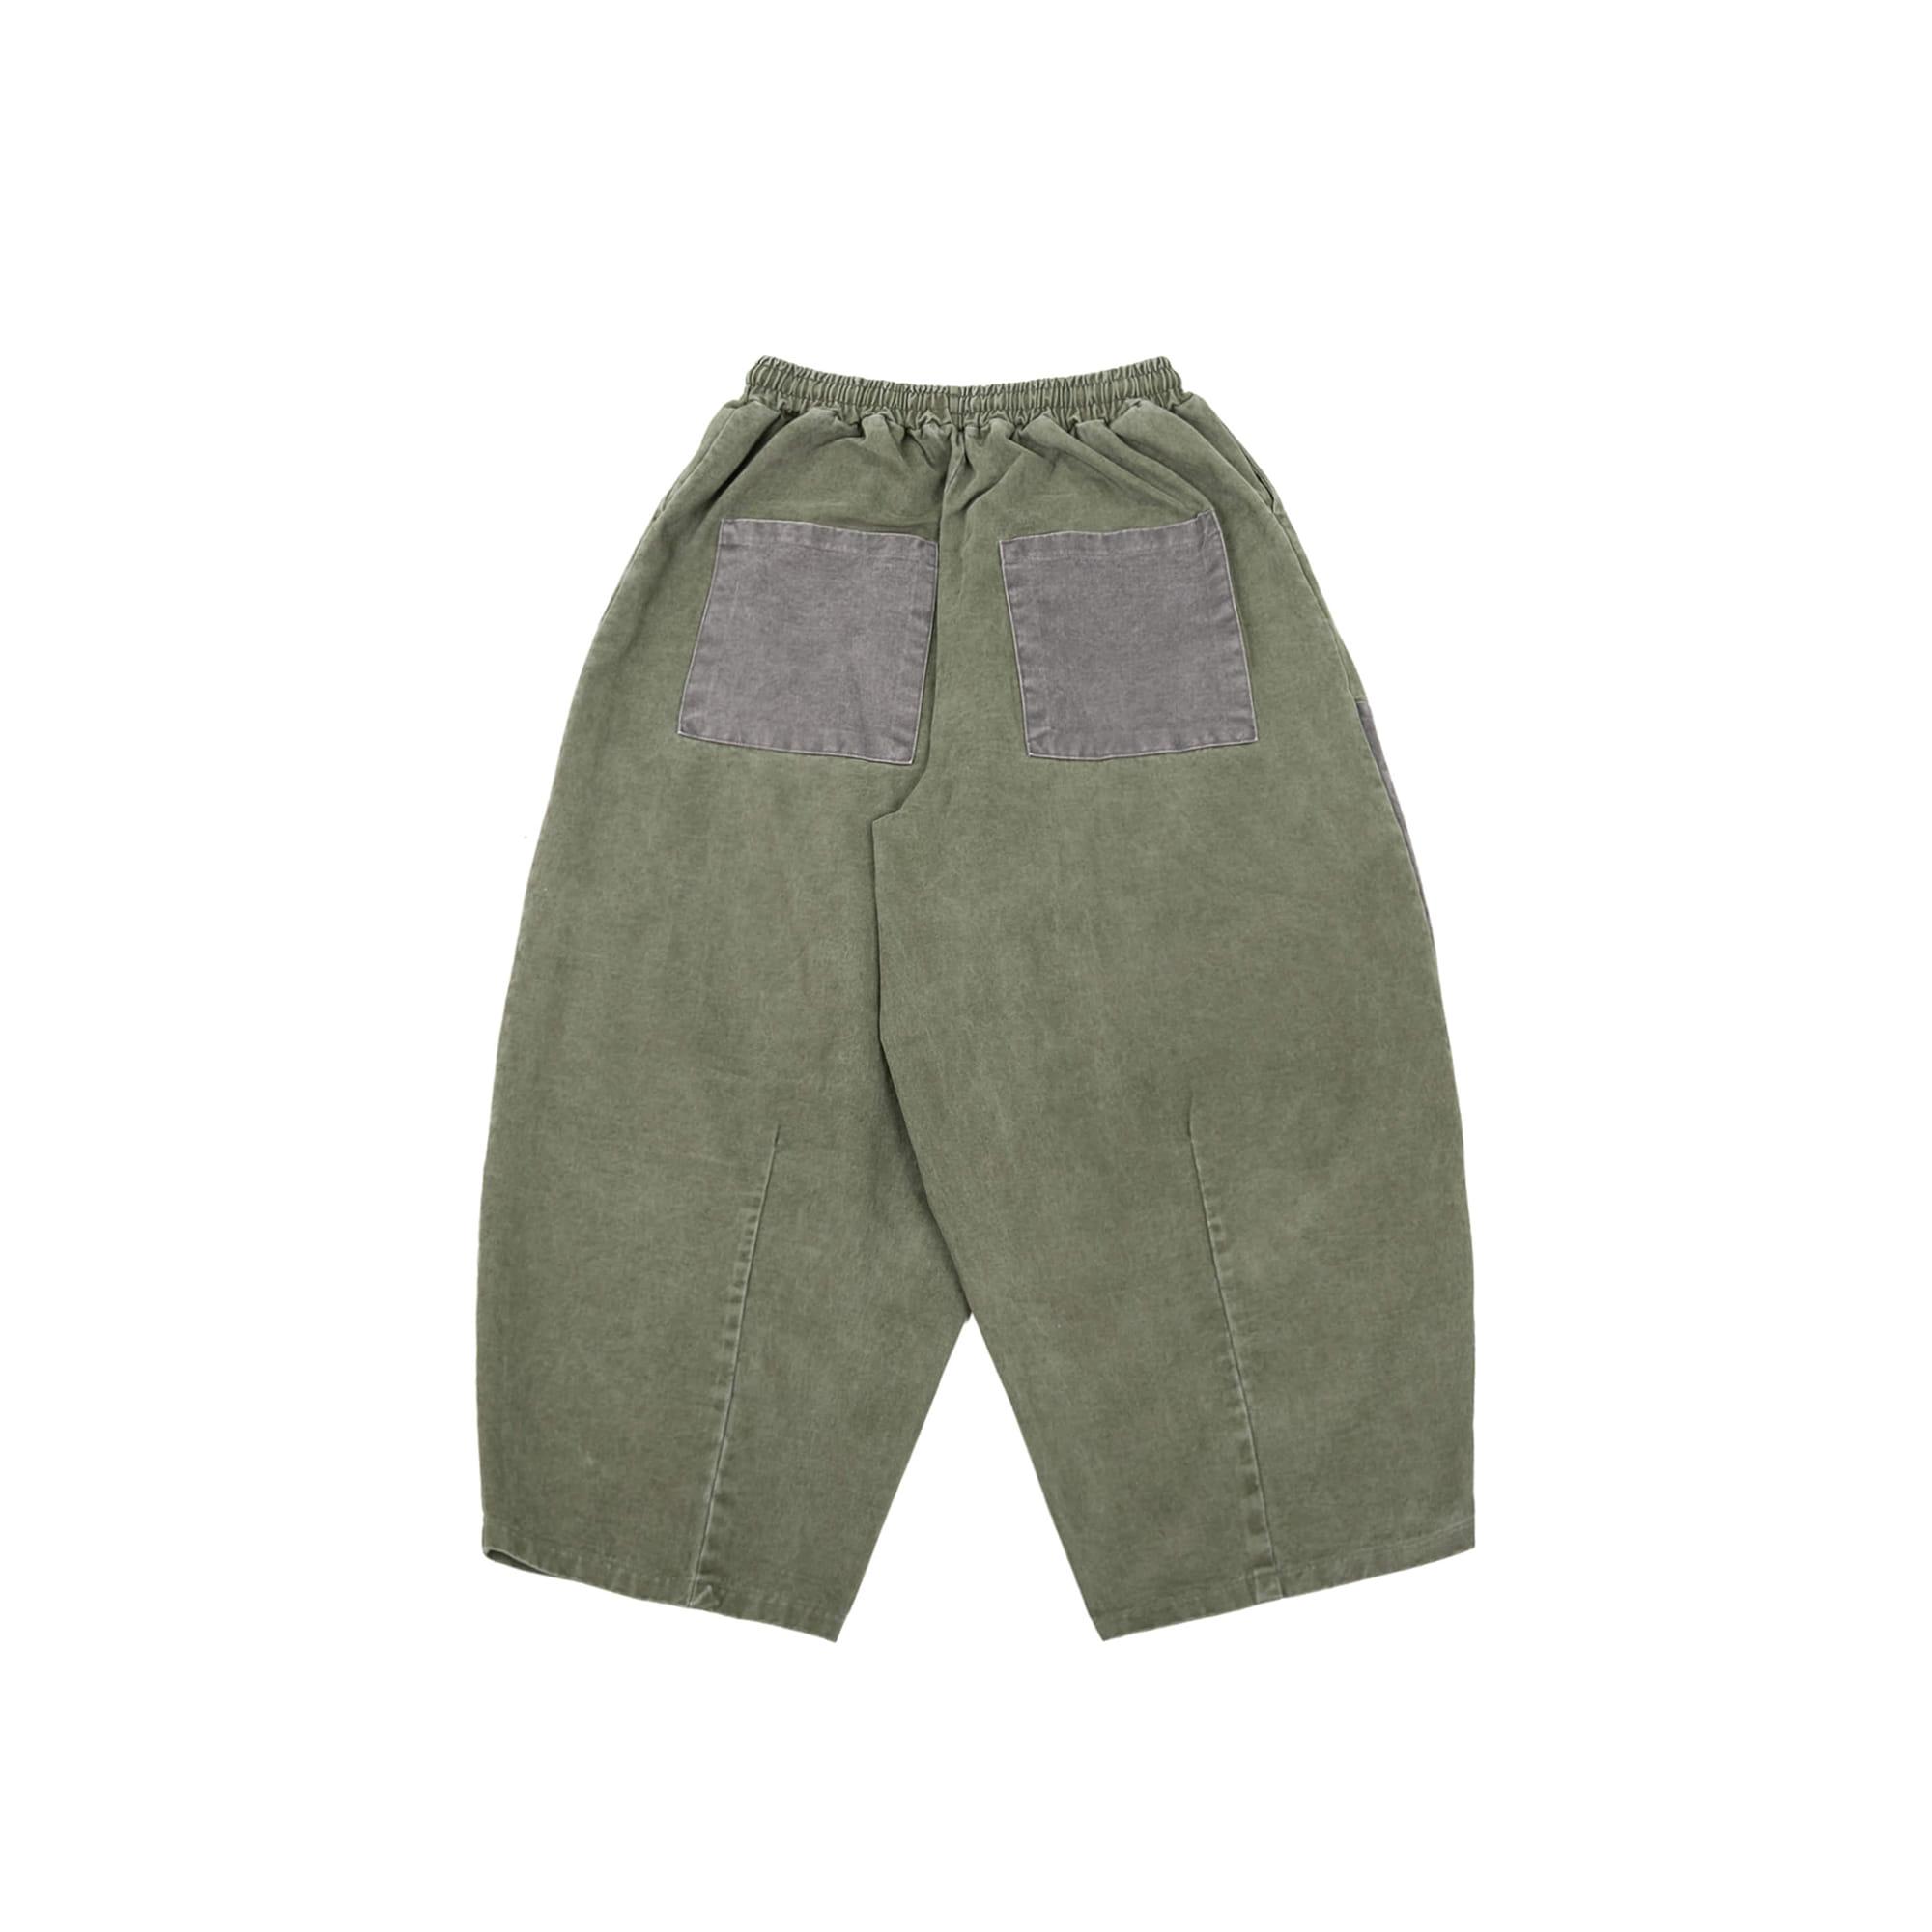 Two Color PatchWork Balloon Pants - Khaki